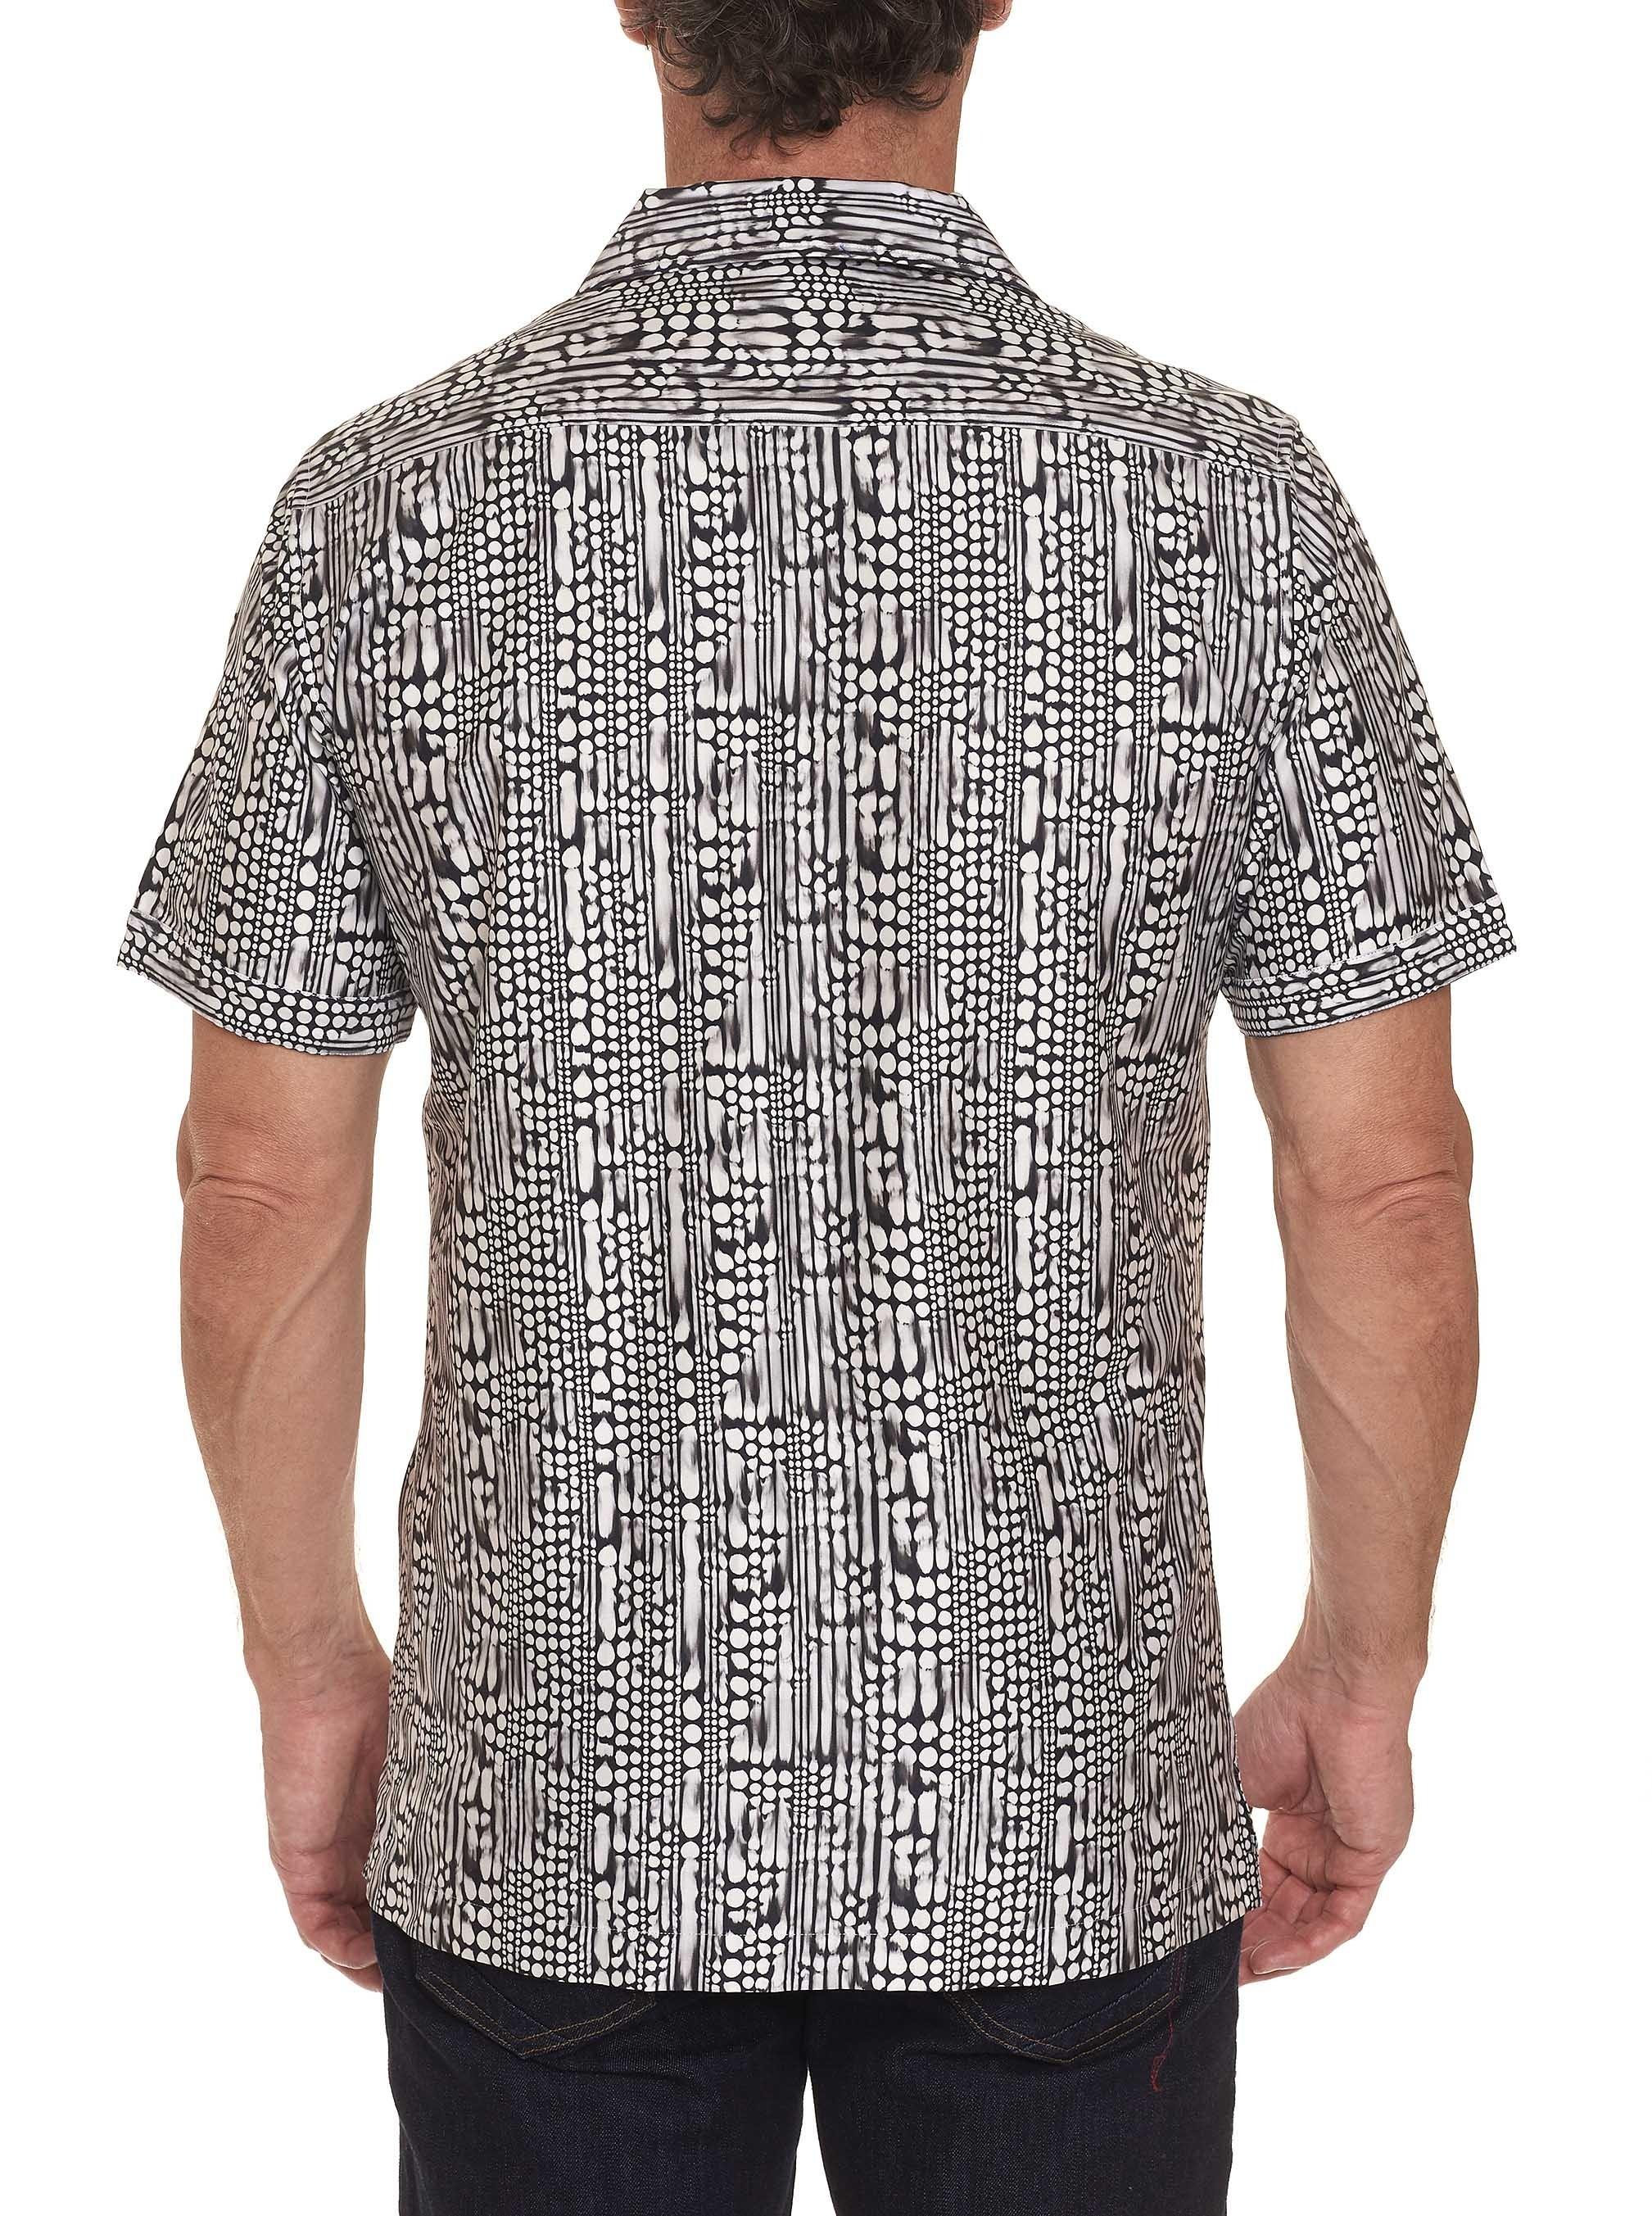 Robert Graham Goliath Short Sleeve Shirt Black